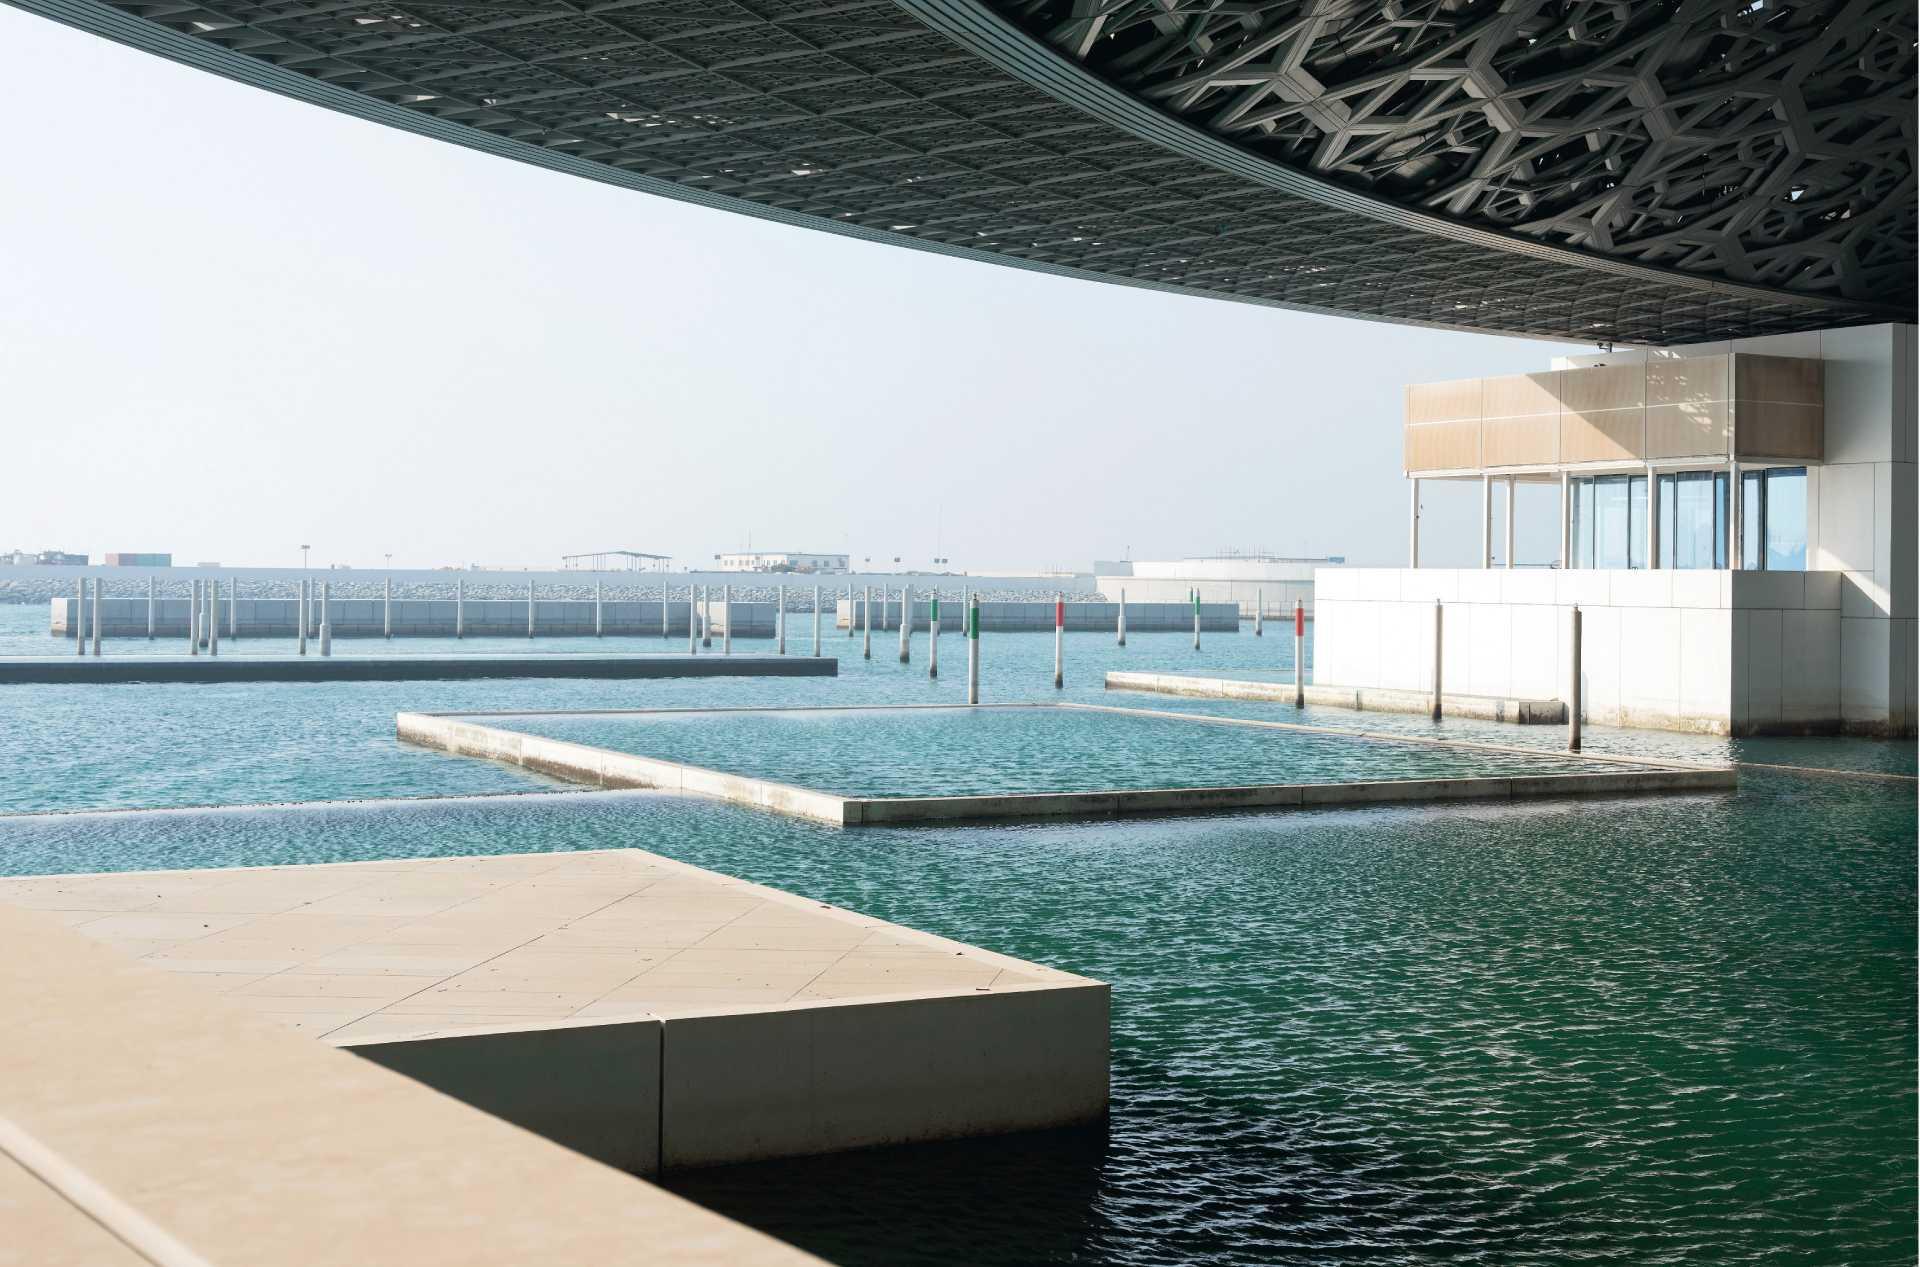 Louvre Abu Dhabi  - 27 03 37